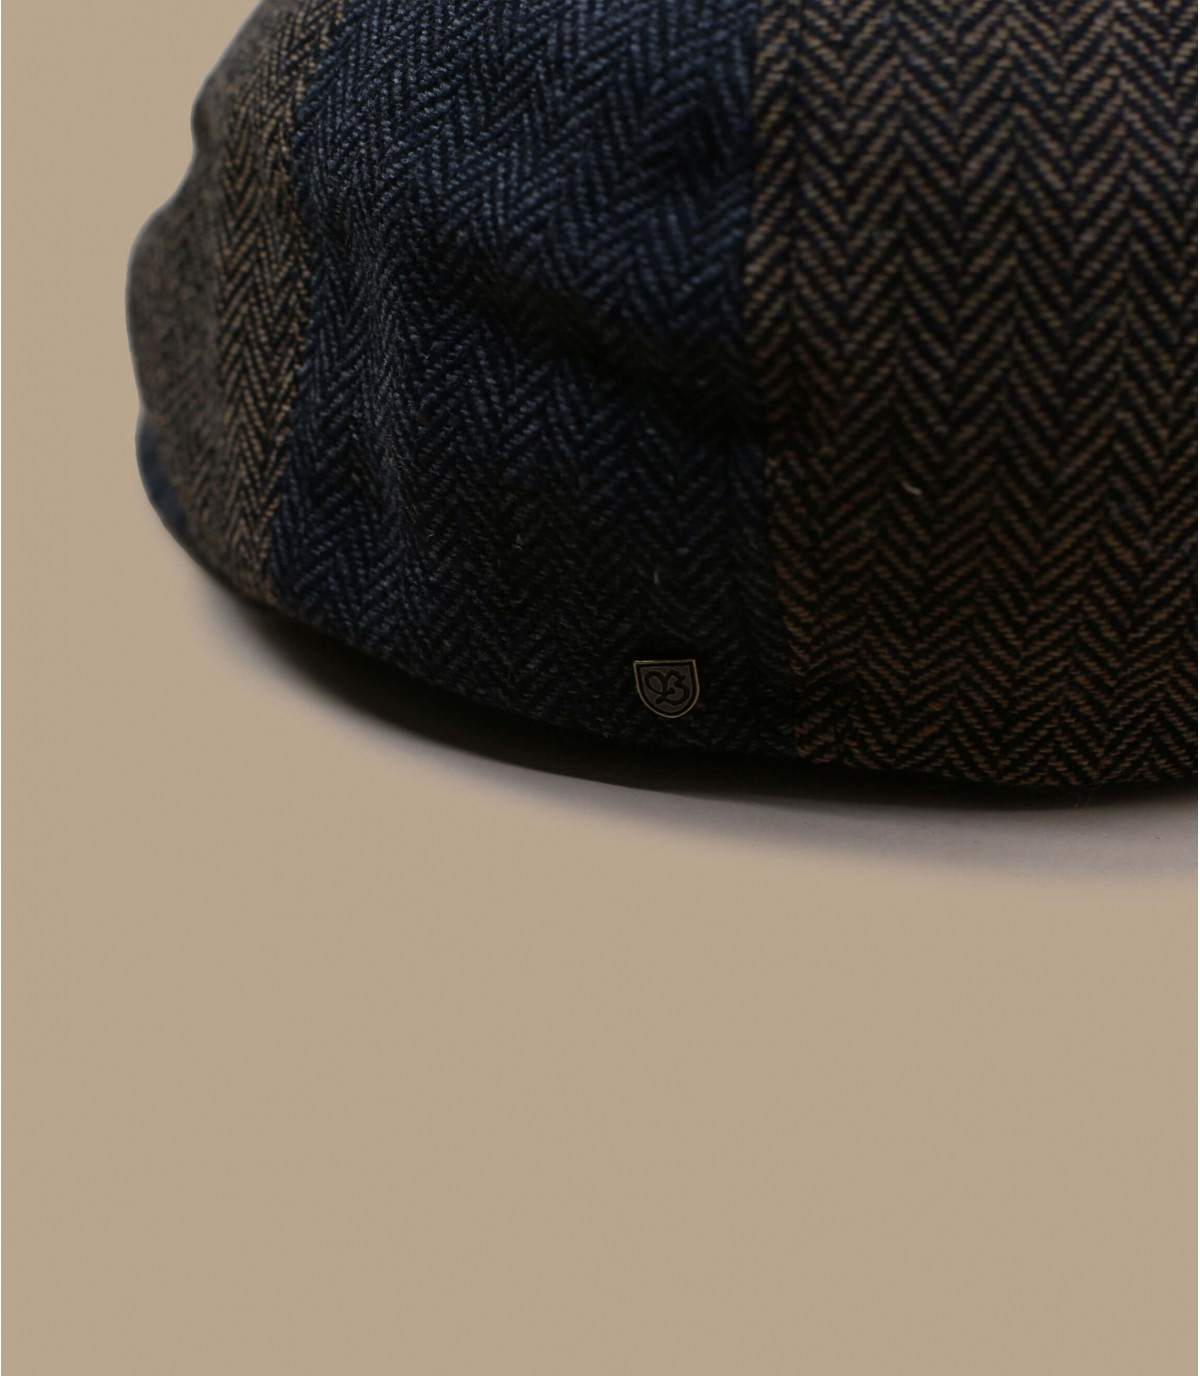 Dettagli Brood brown grey - image 2